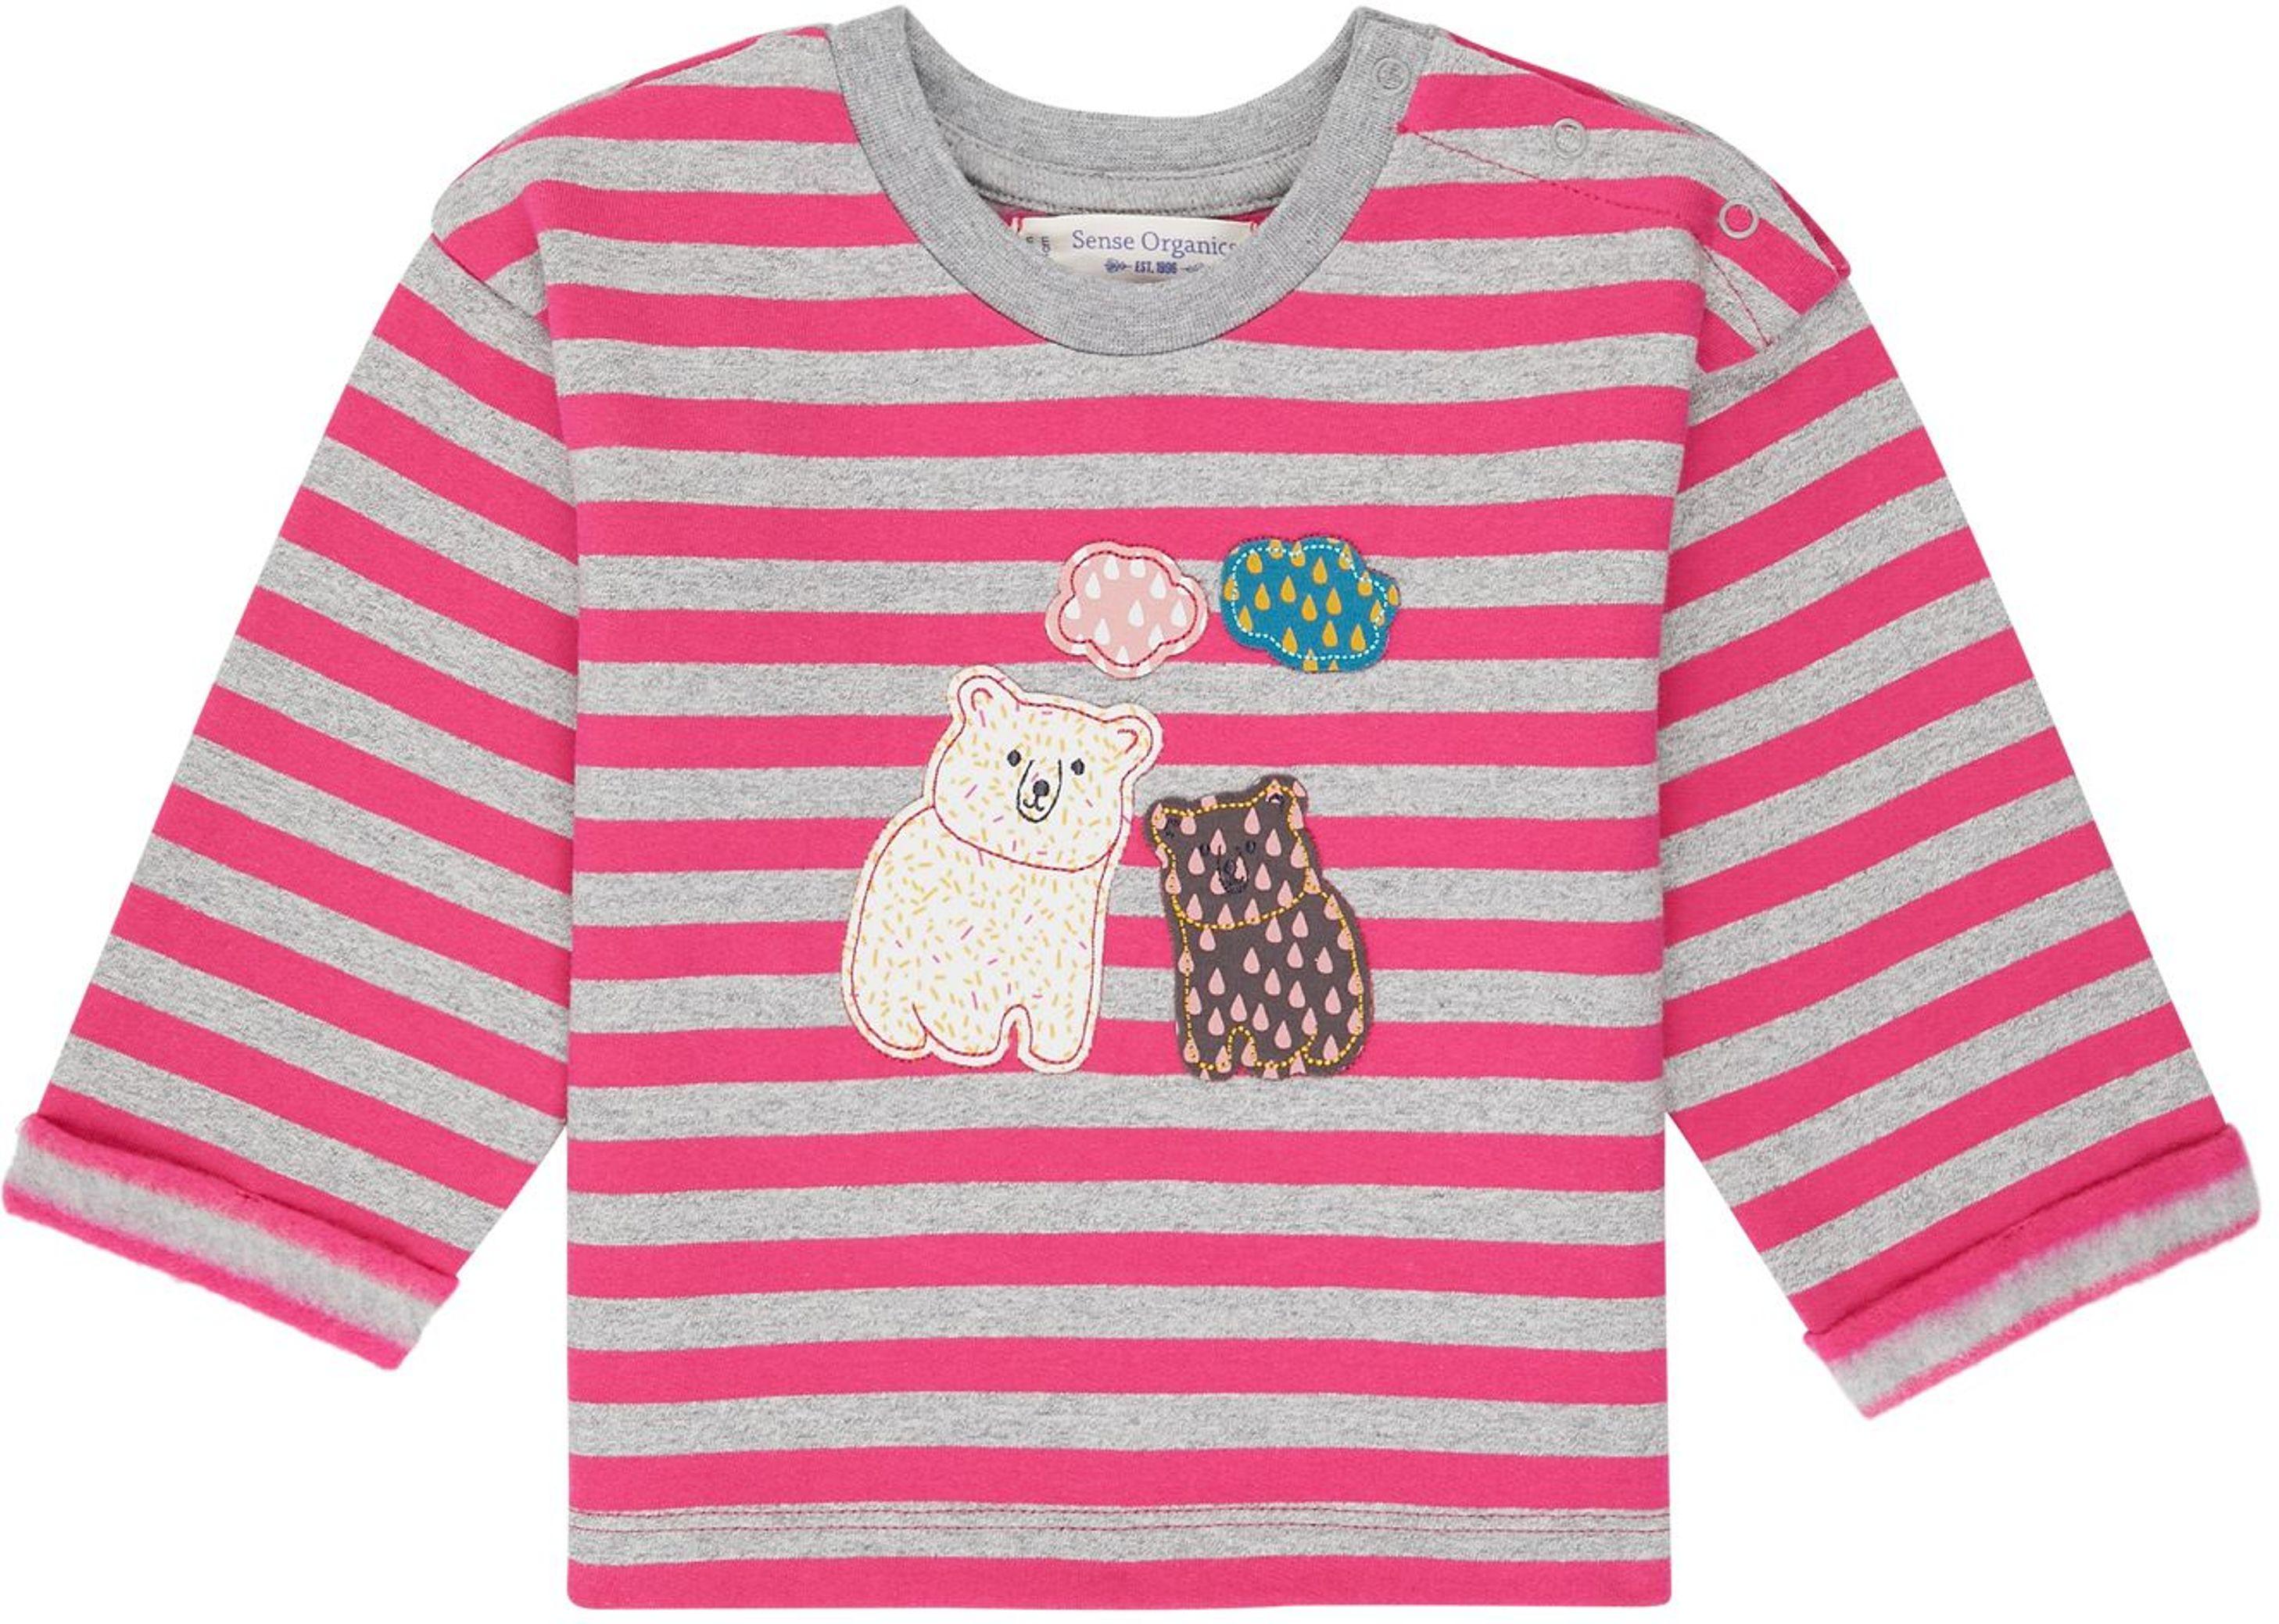 Sense Organic NOLANI Baby Sweater pink/polar bear